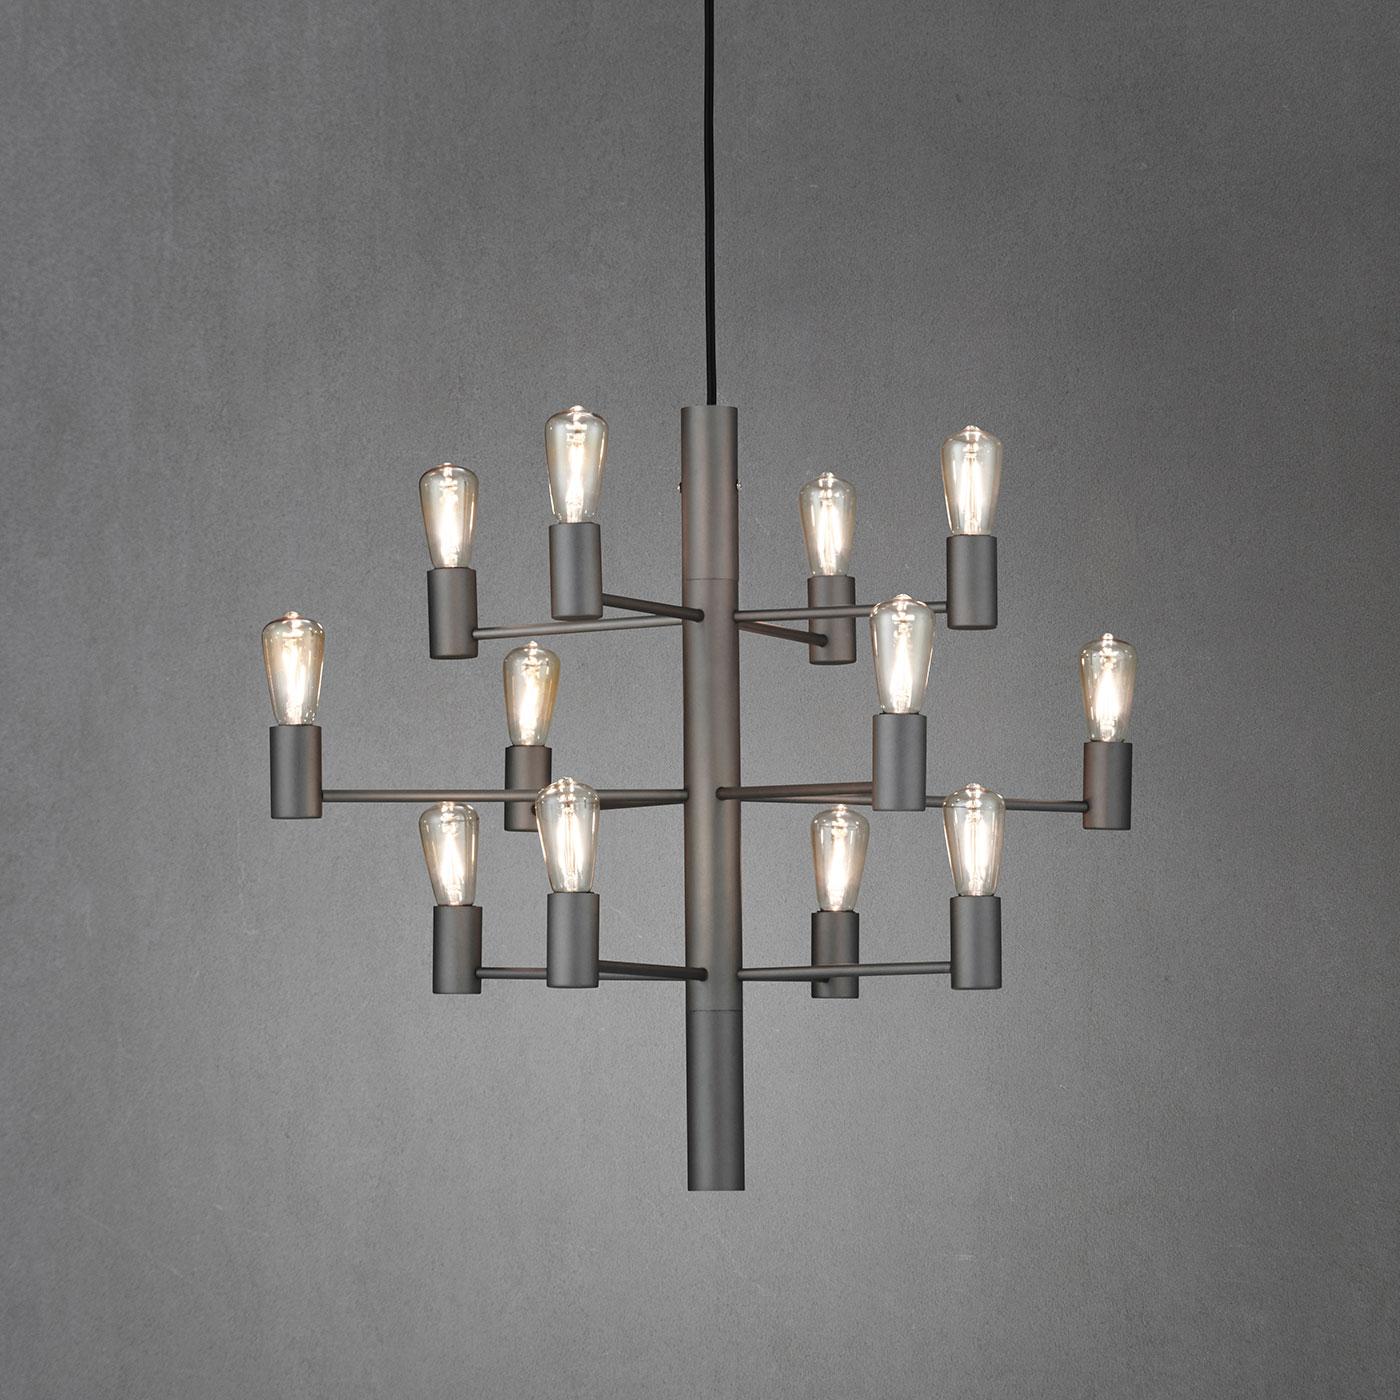 Herstal Manola 12 Dimbar LED Ljuskrona Grafit grå